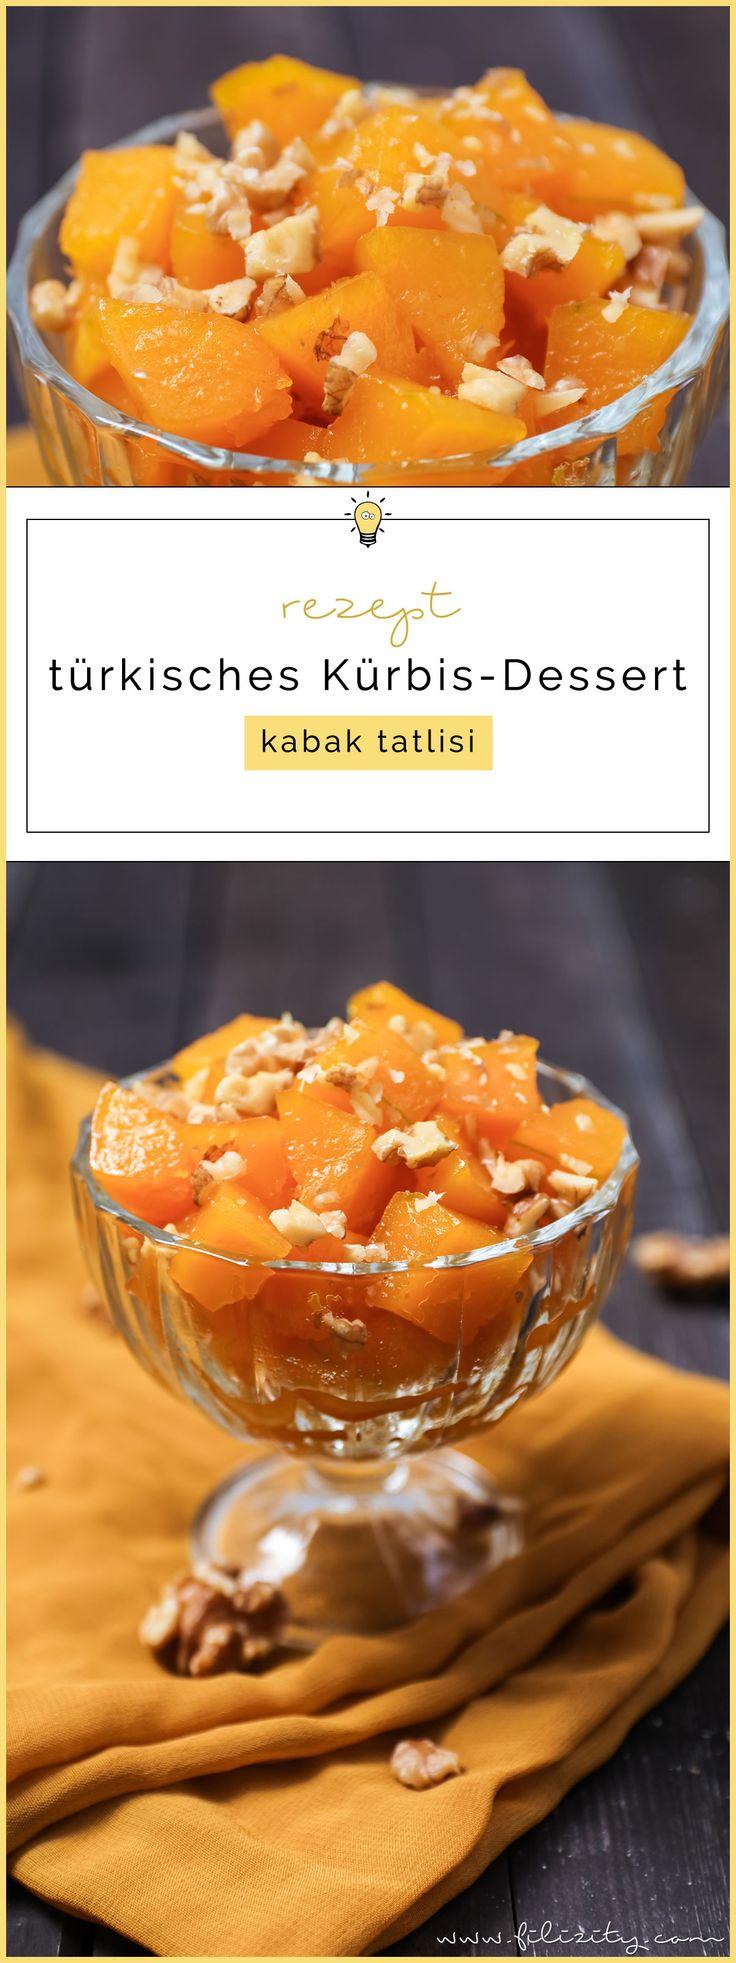 Herbst-Rezept: Türkisches Kürbis-Dessert (Kabak Tatlisi) #dessert #kürbis #vegan